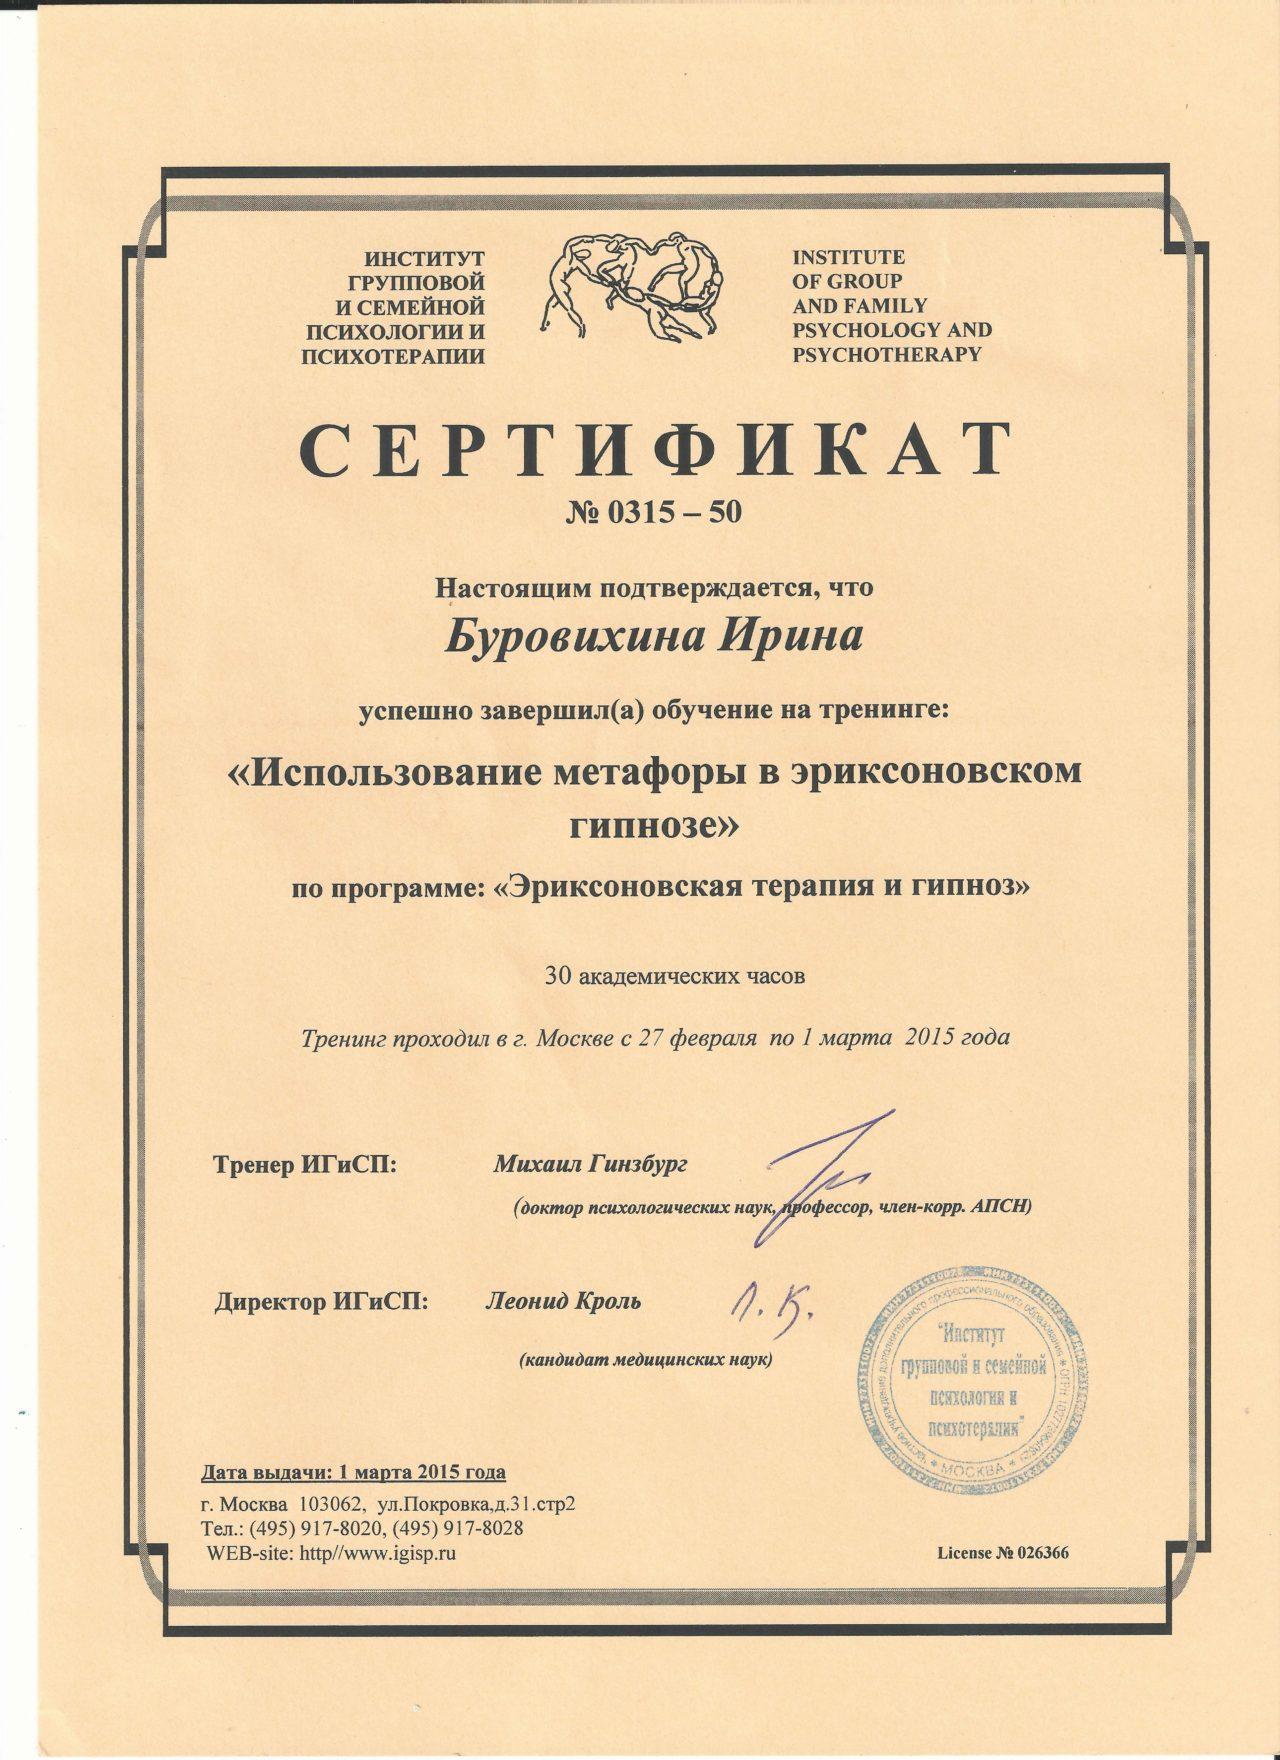 Буровихина Ирина сертификат метафора эриксоновский гипноз